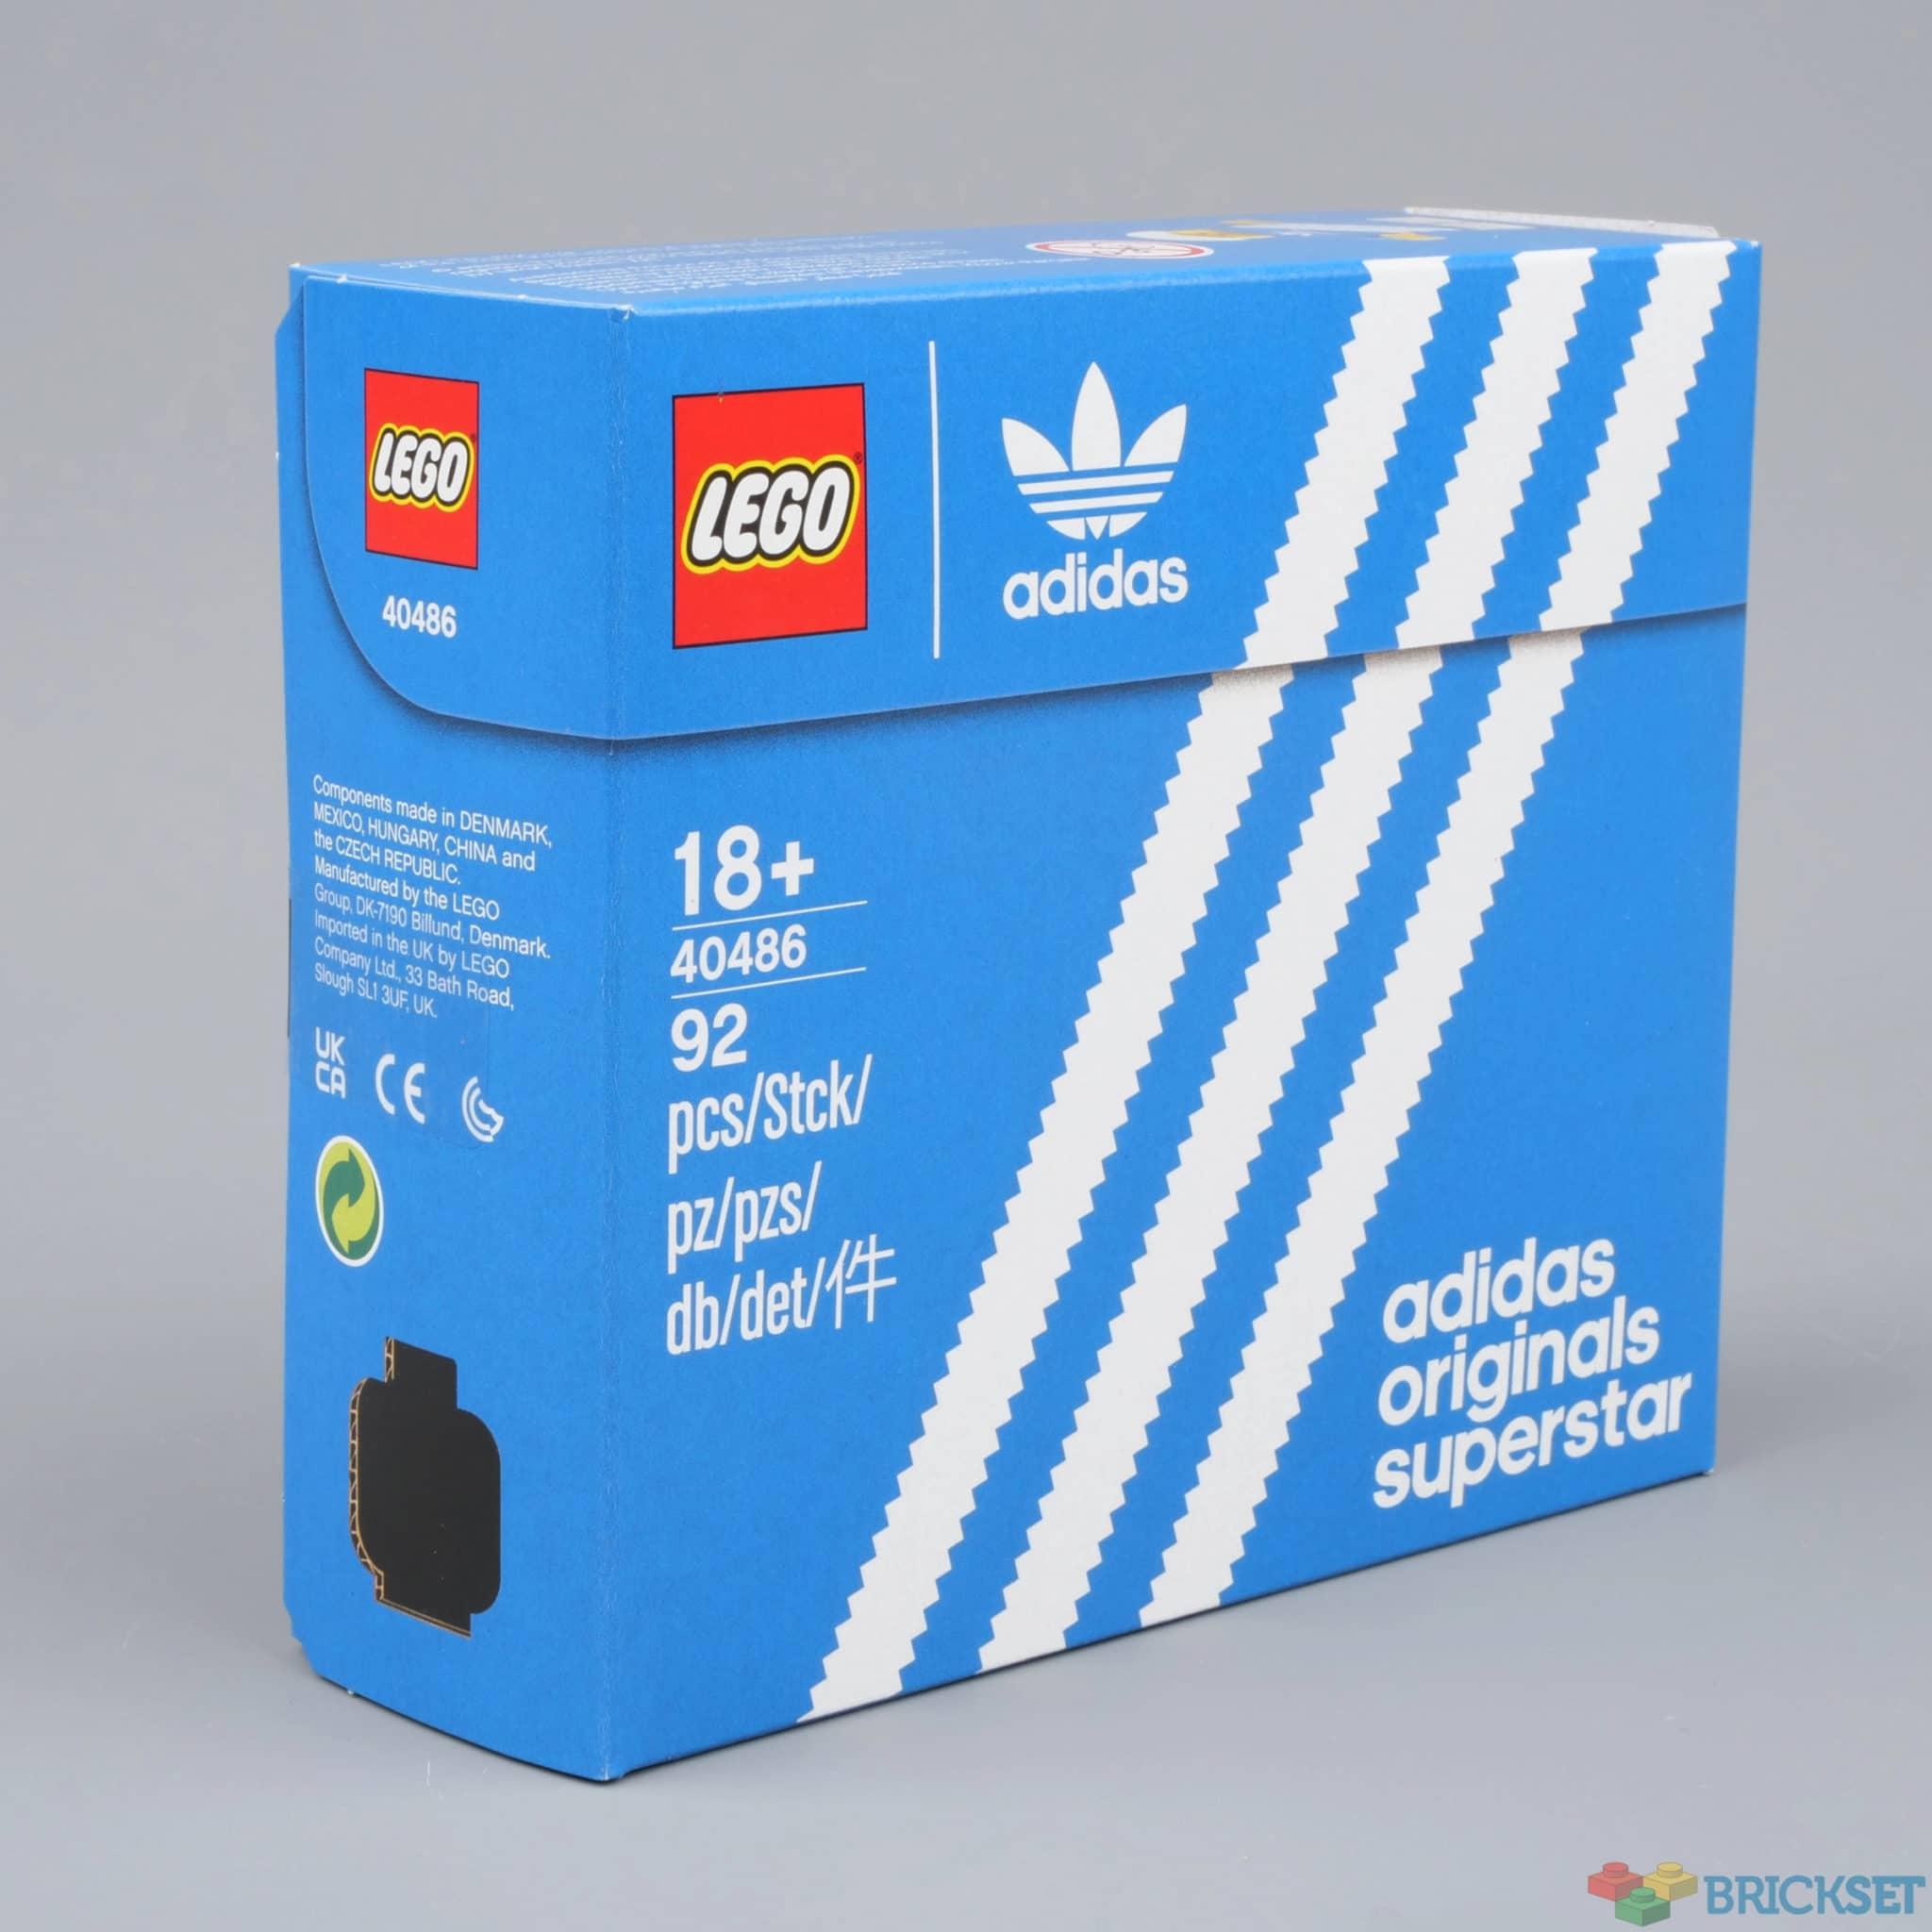 LEGO 40486 Mini Adidas Originals Superstar Box Brickset